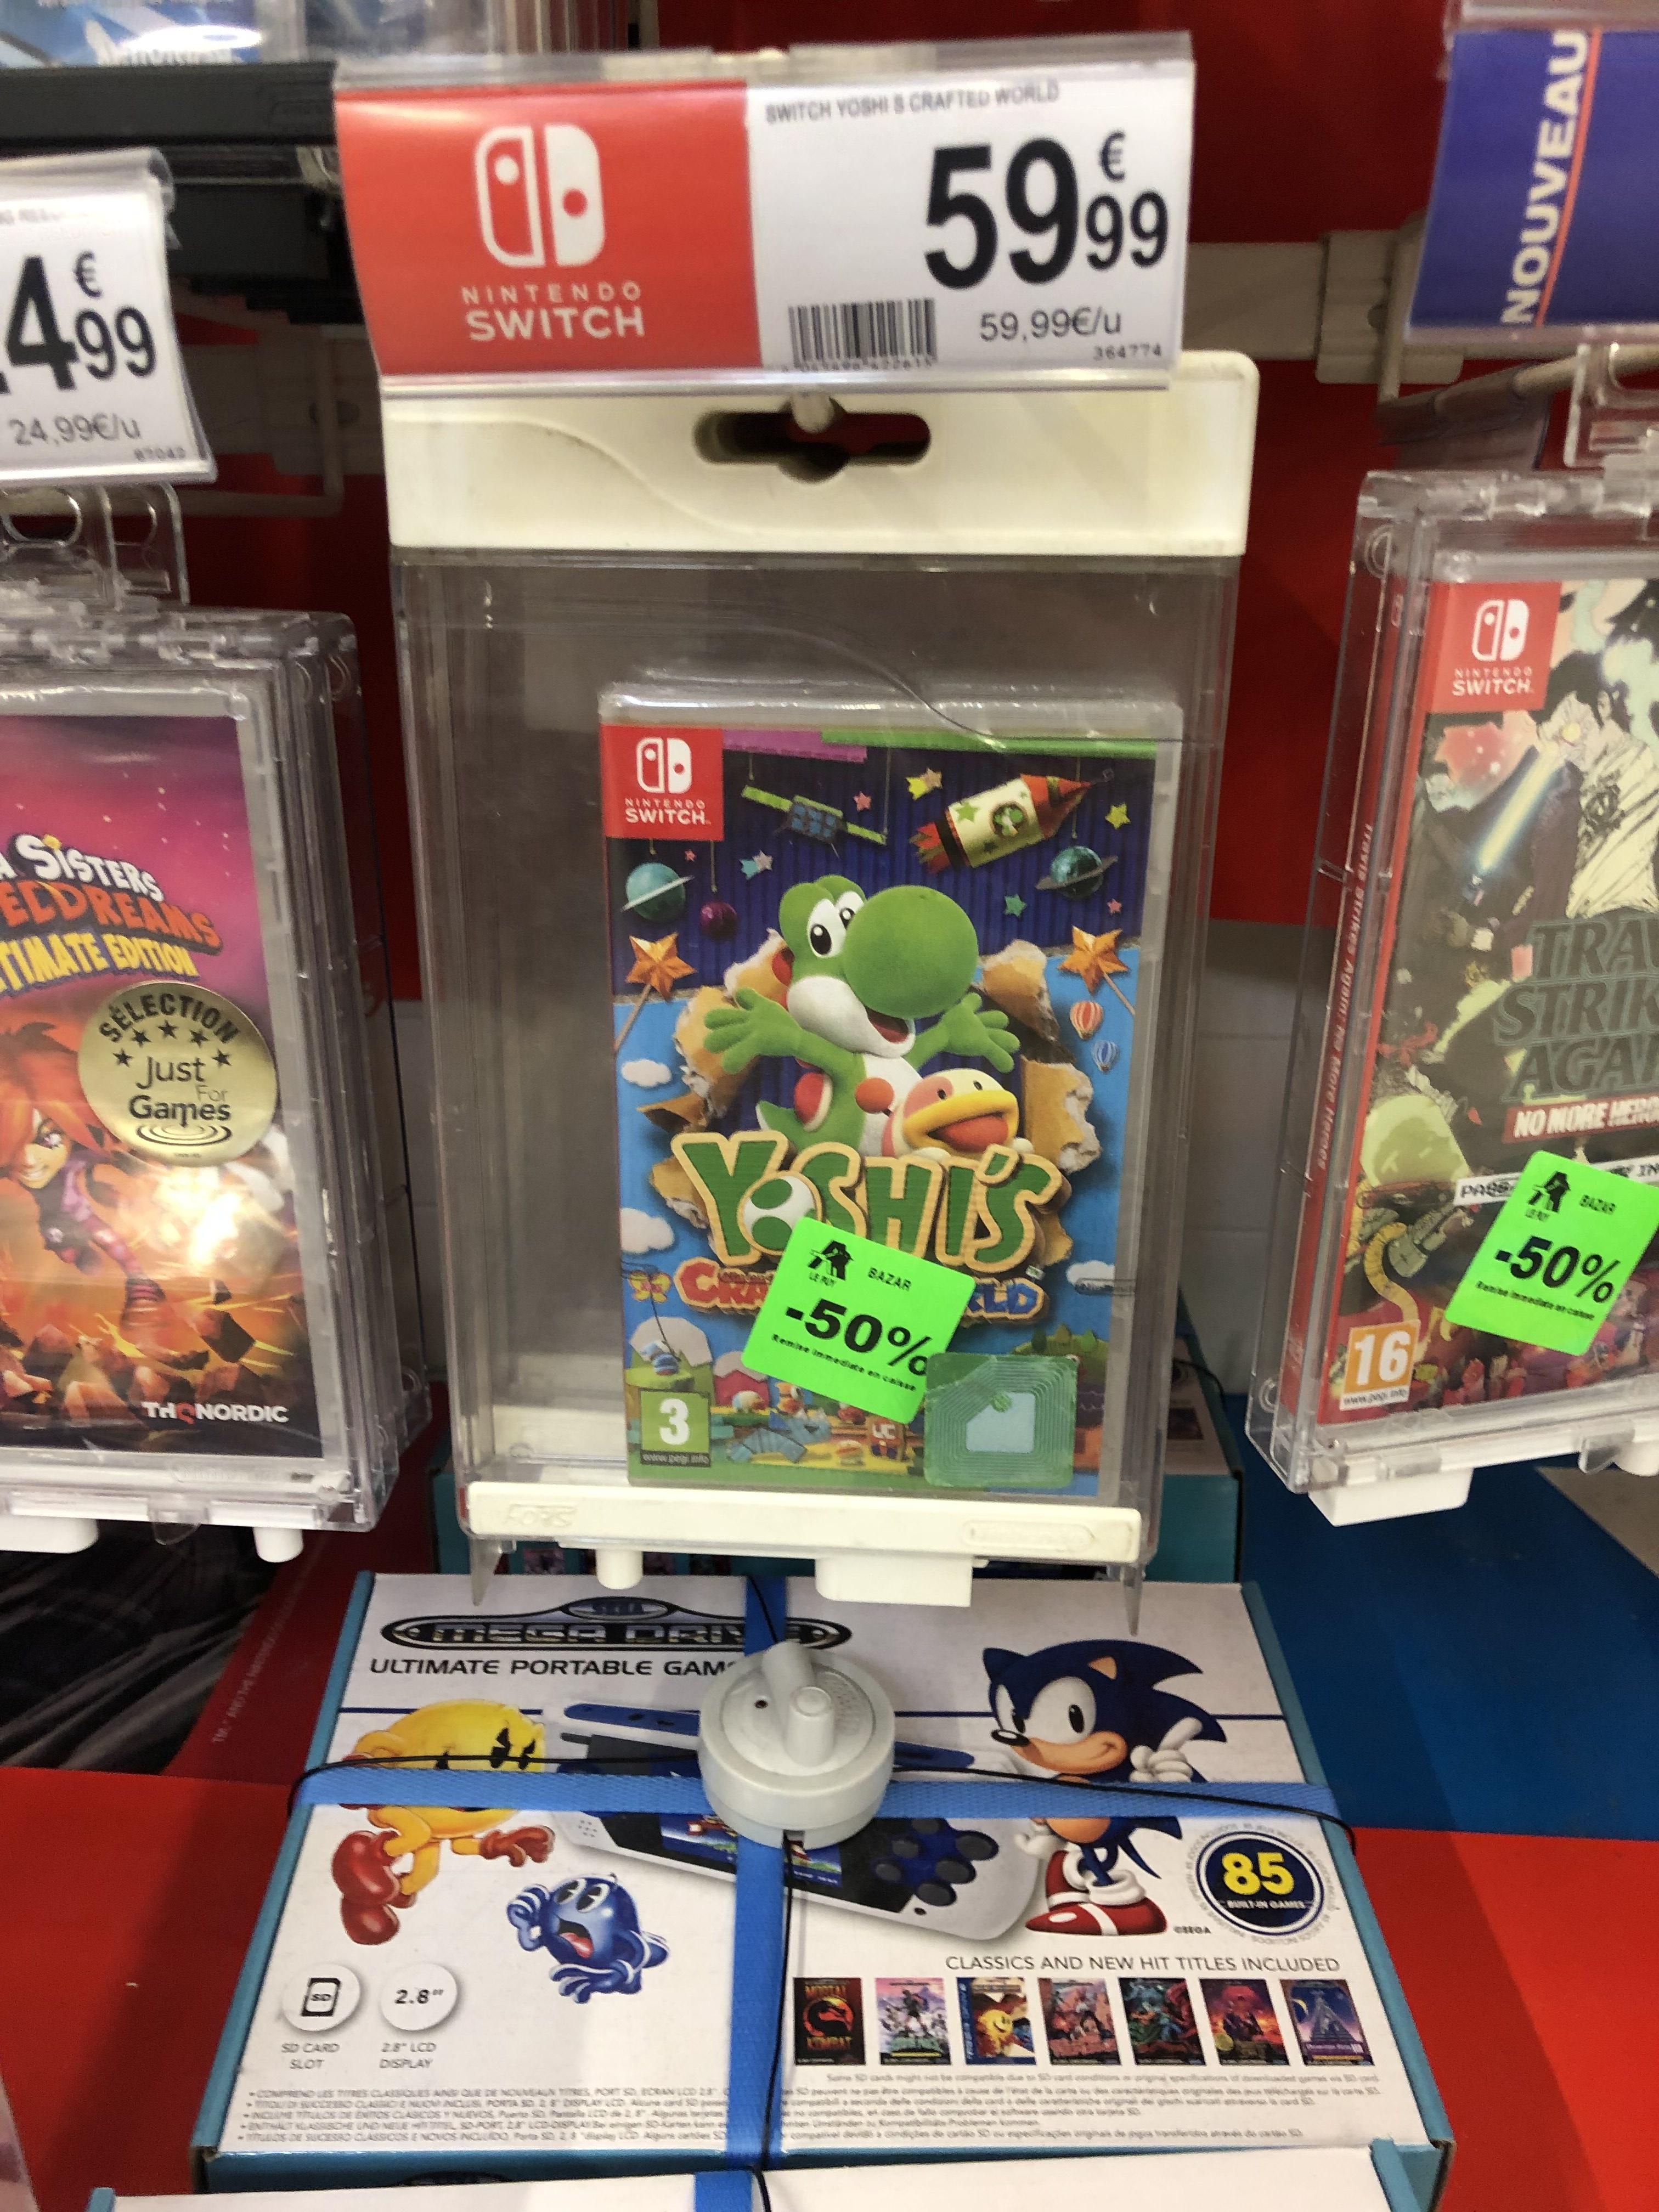 Sélection de jeux Nintendo Switch en promotion - Ex: Yoshi's Crafted World - Brives Charensac (43)